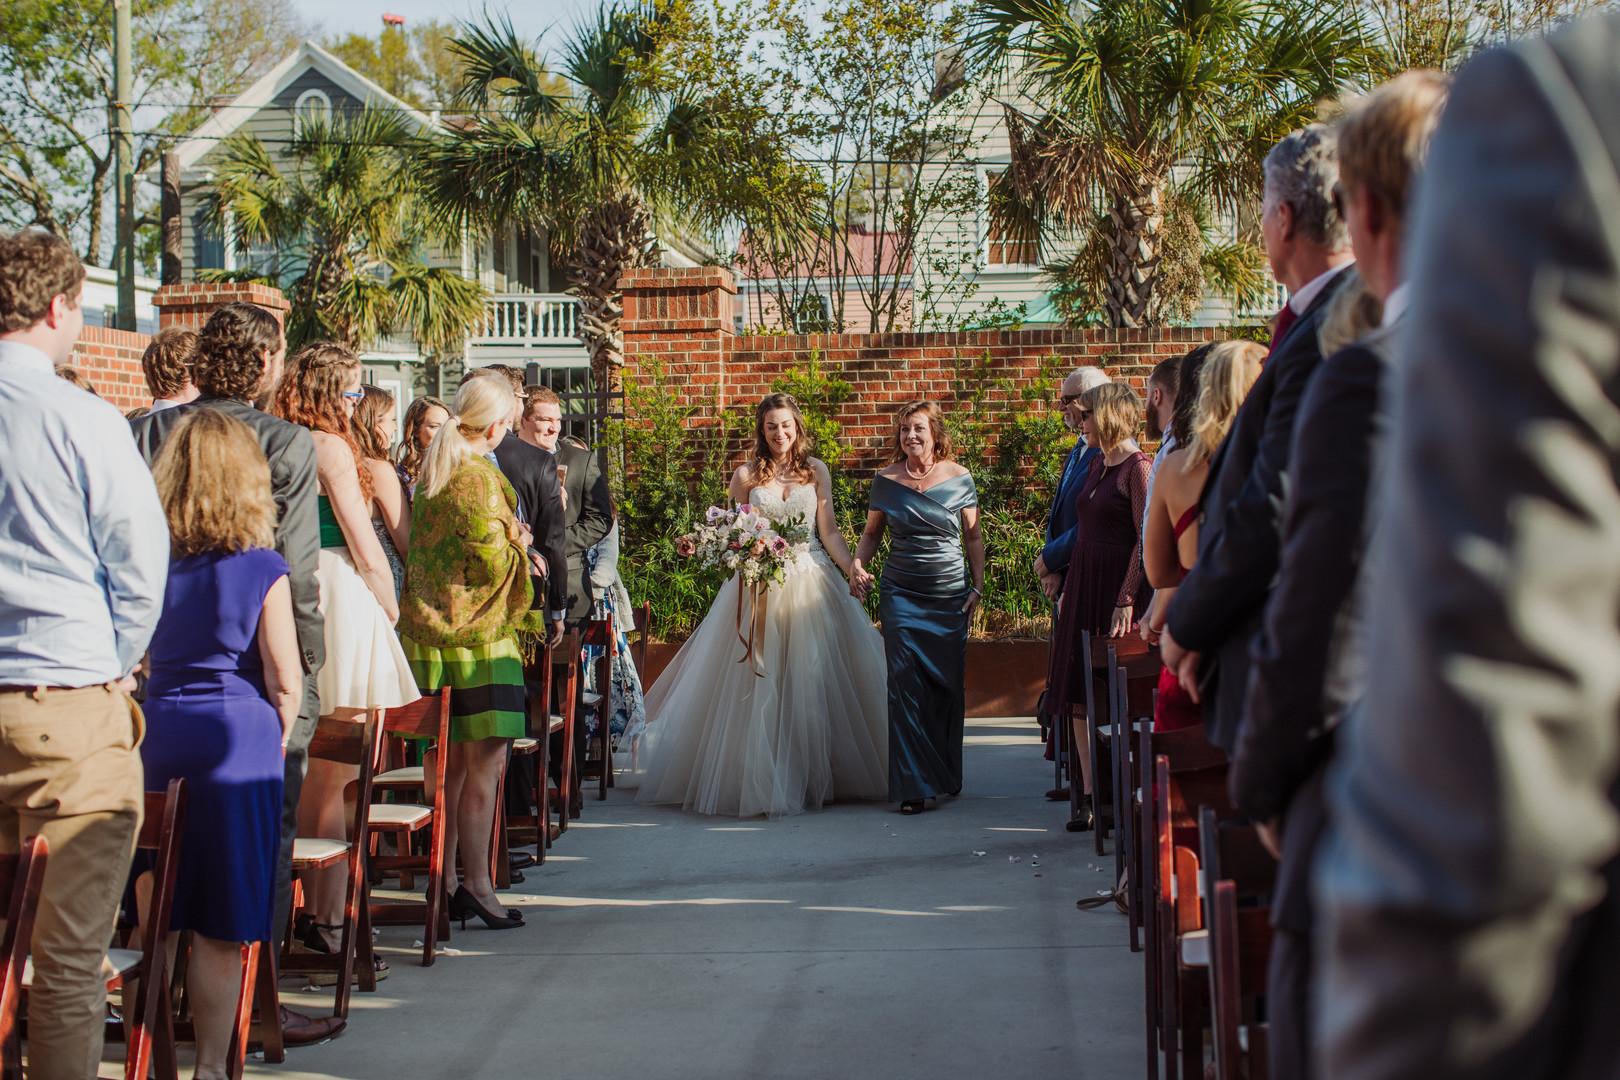 cedar-room-wedding-9.jpg